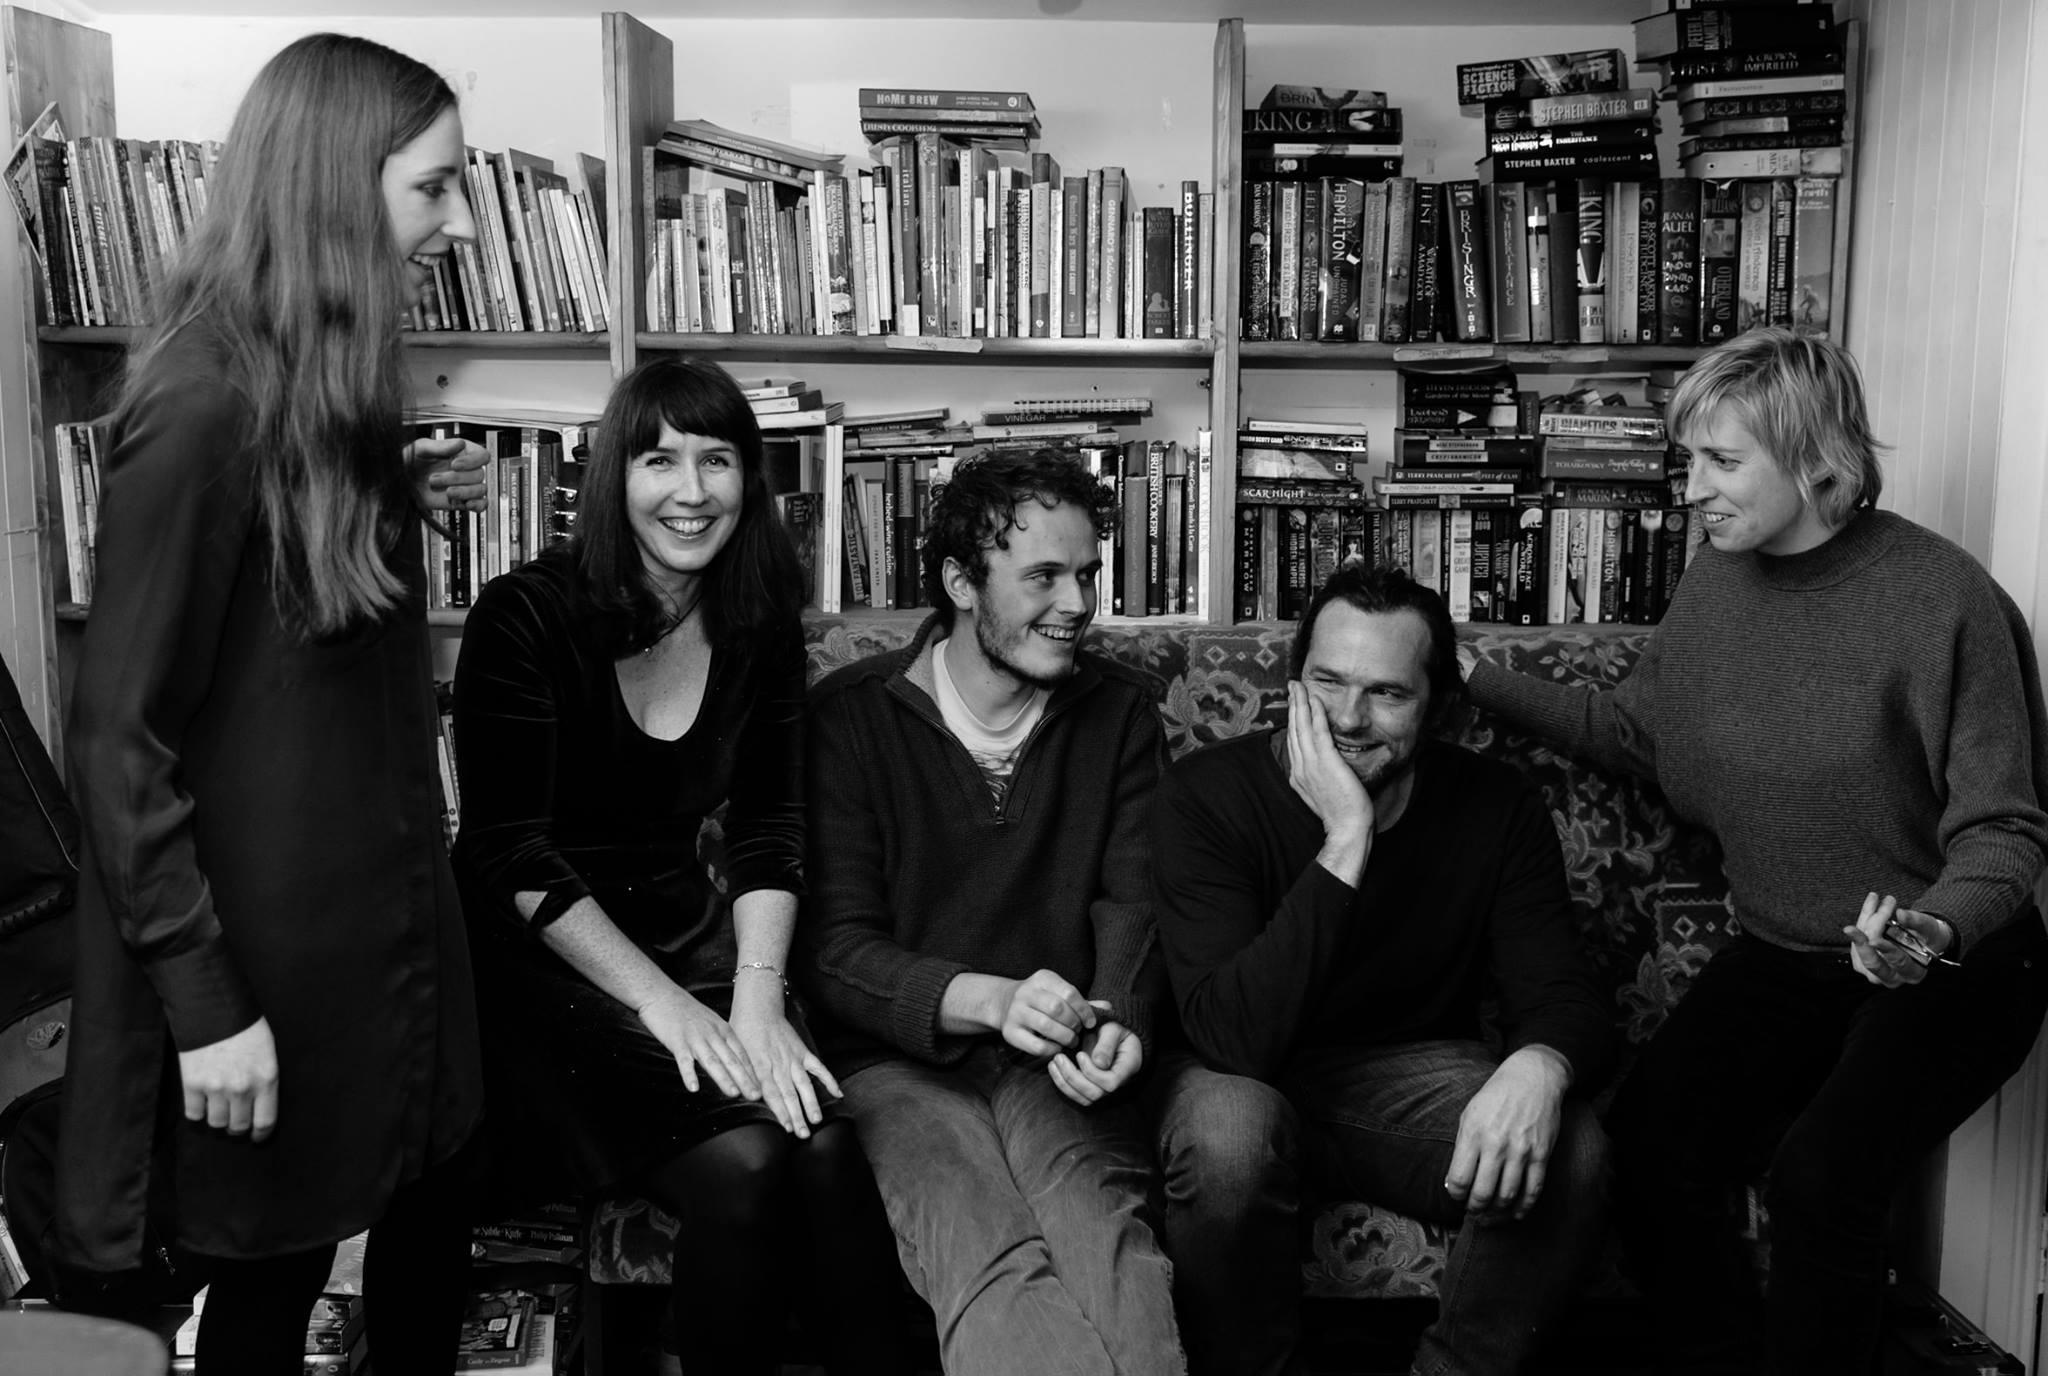 Blind Poets release new single 'Luna Solara'